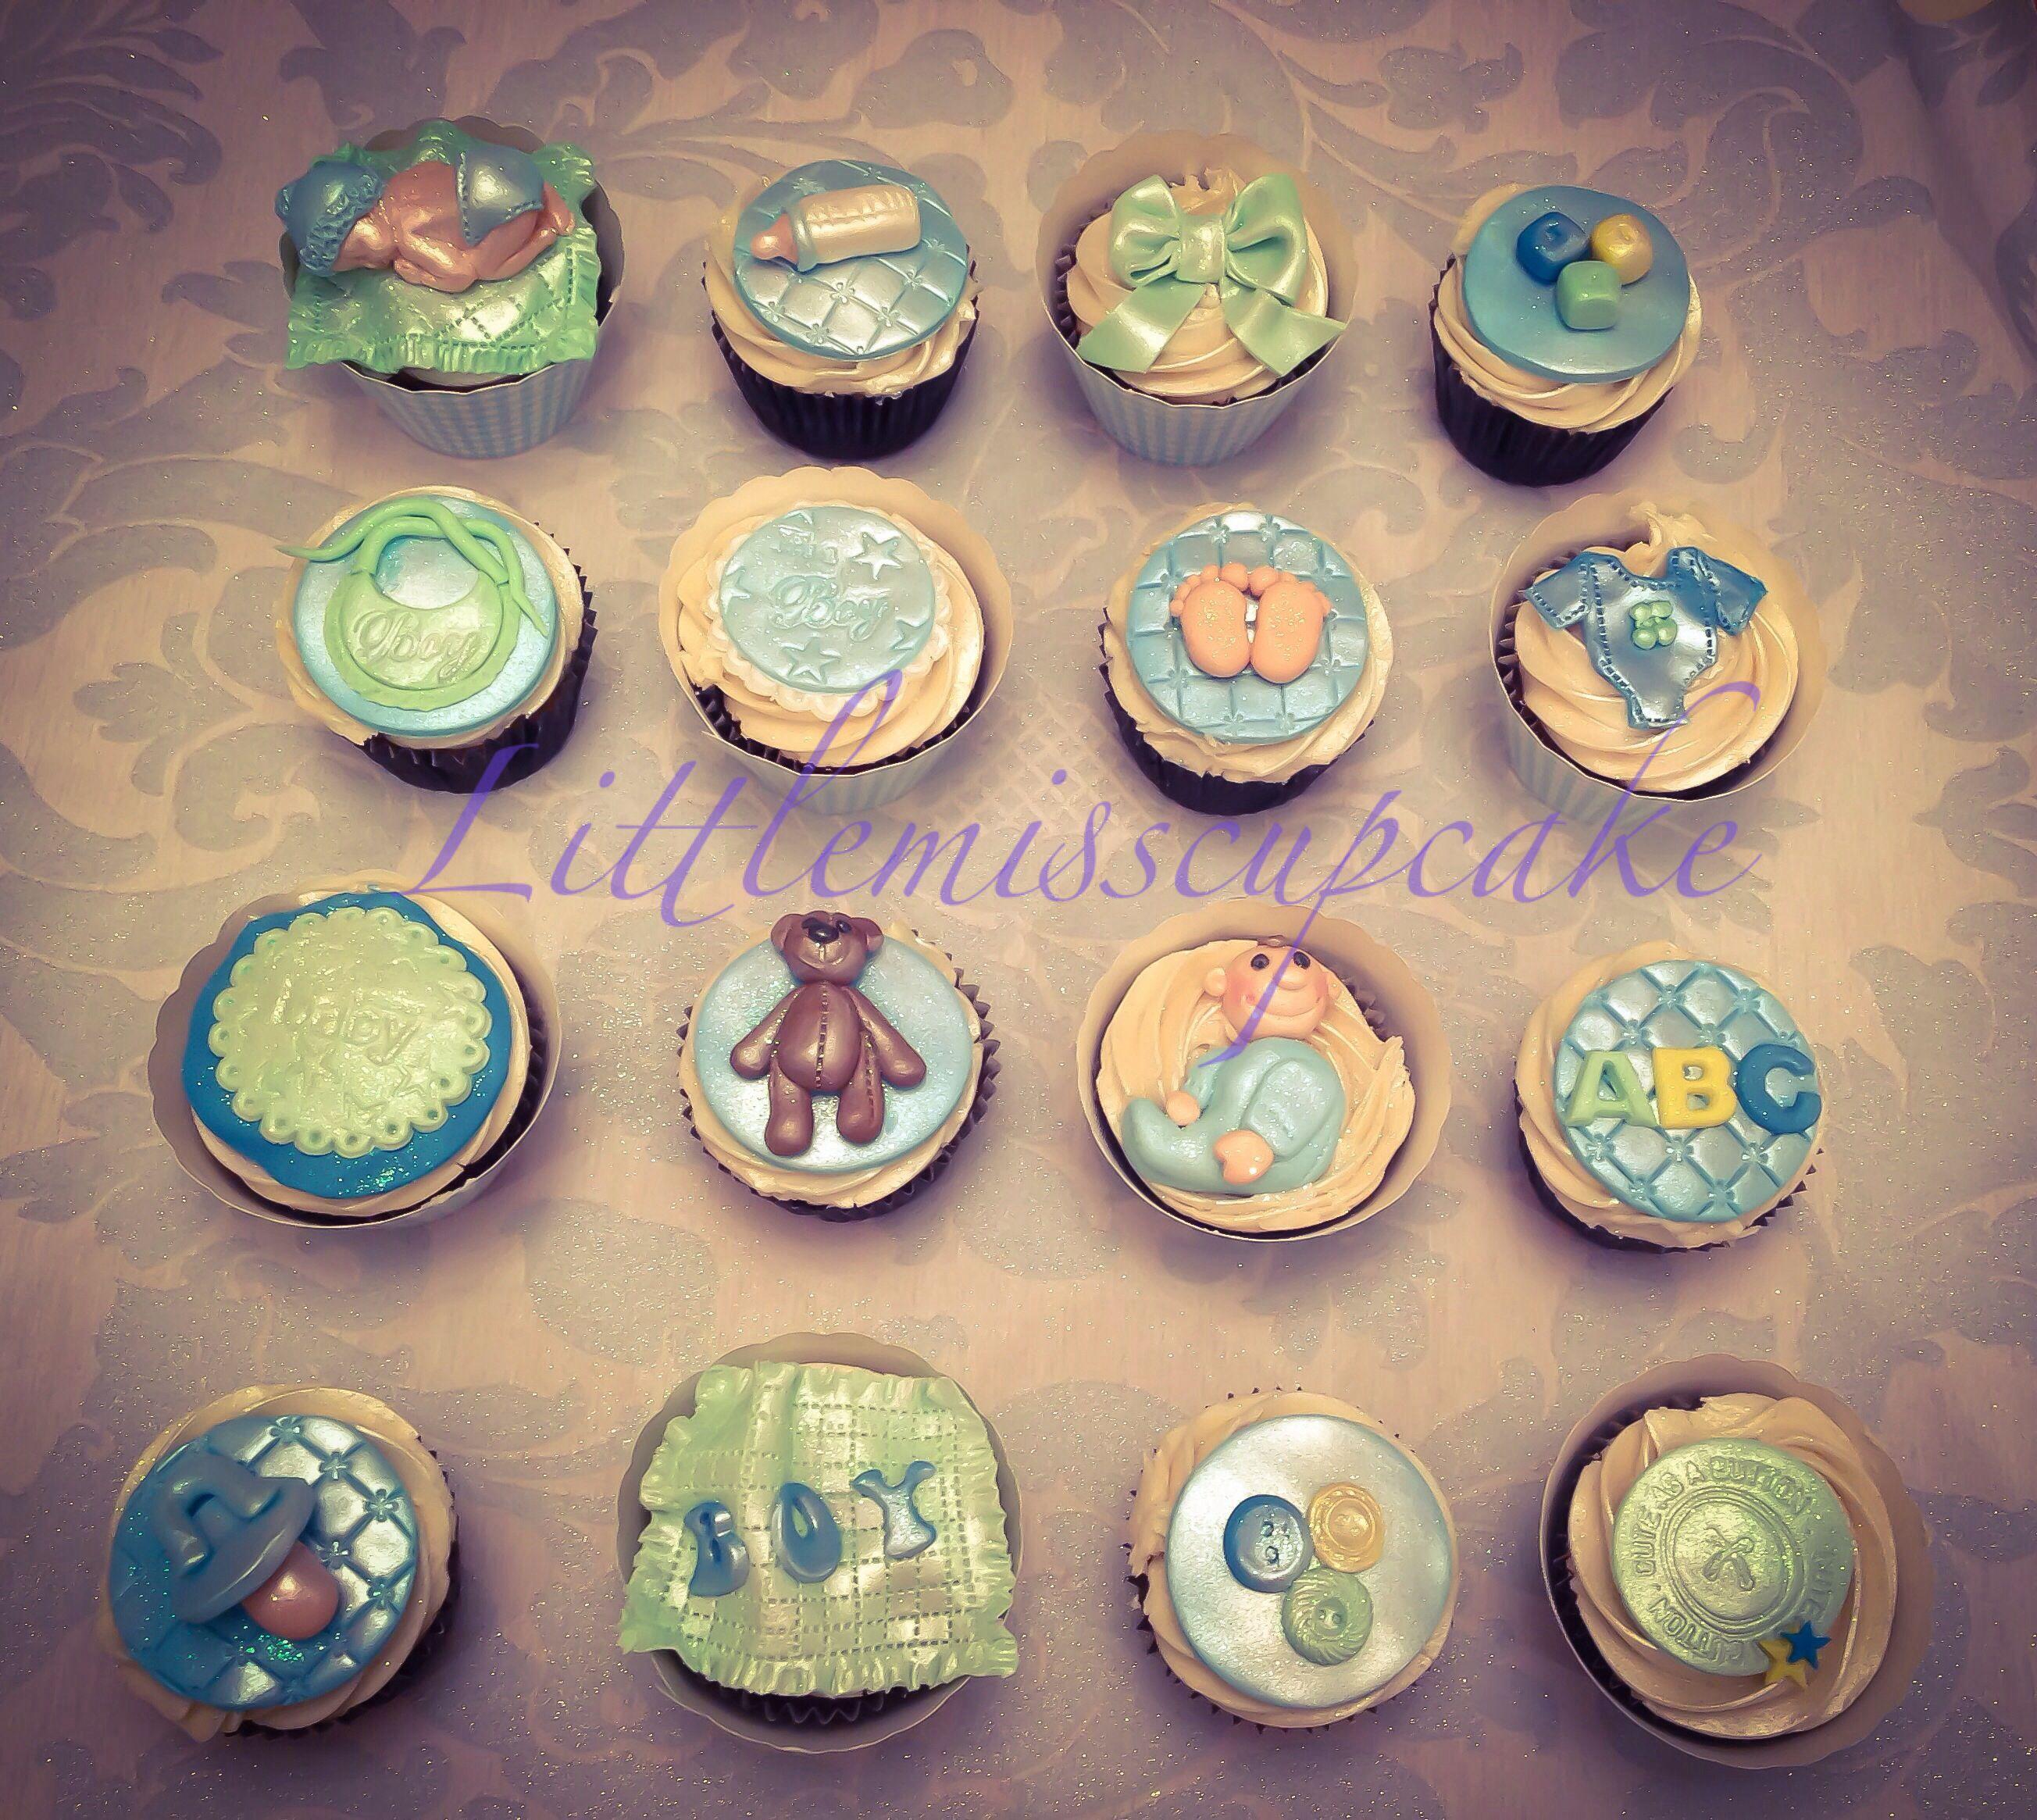 Baby boy baby shower cupcakes by littlemisscupcake exmouth Devon